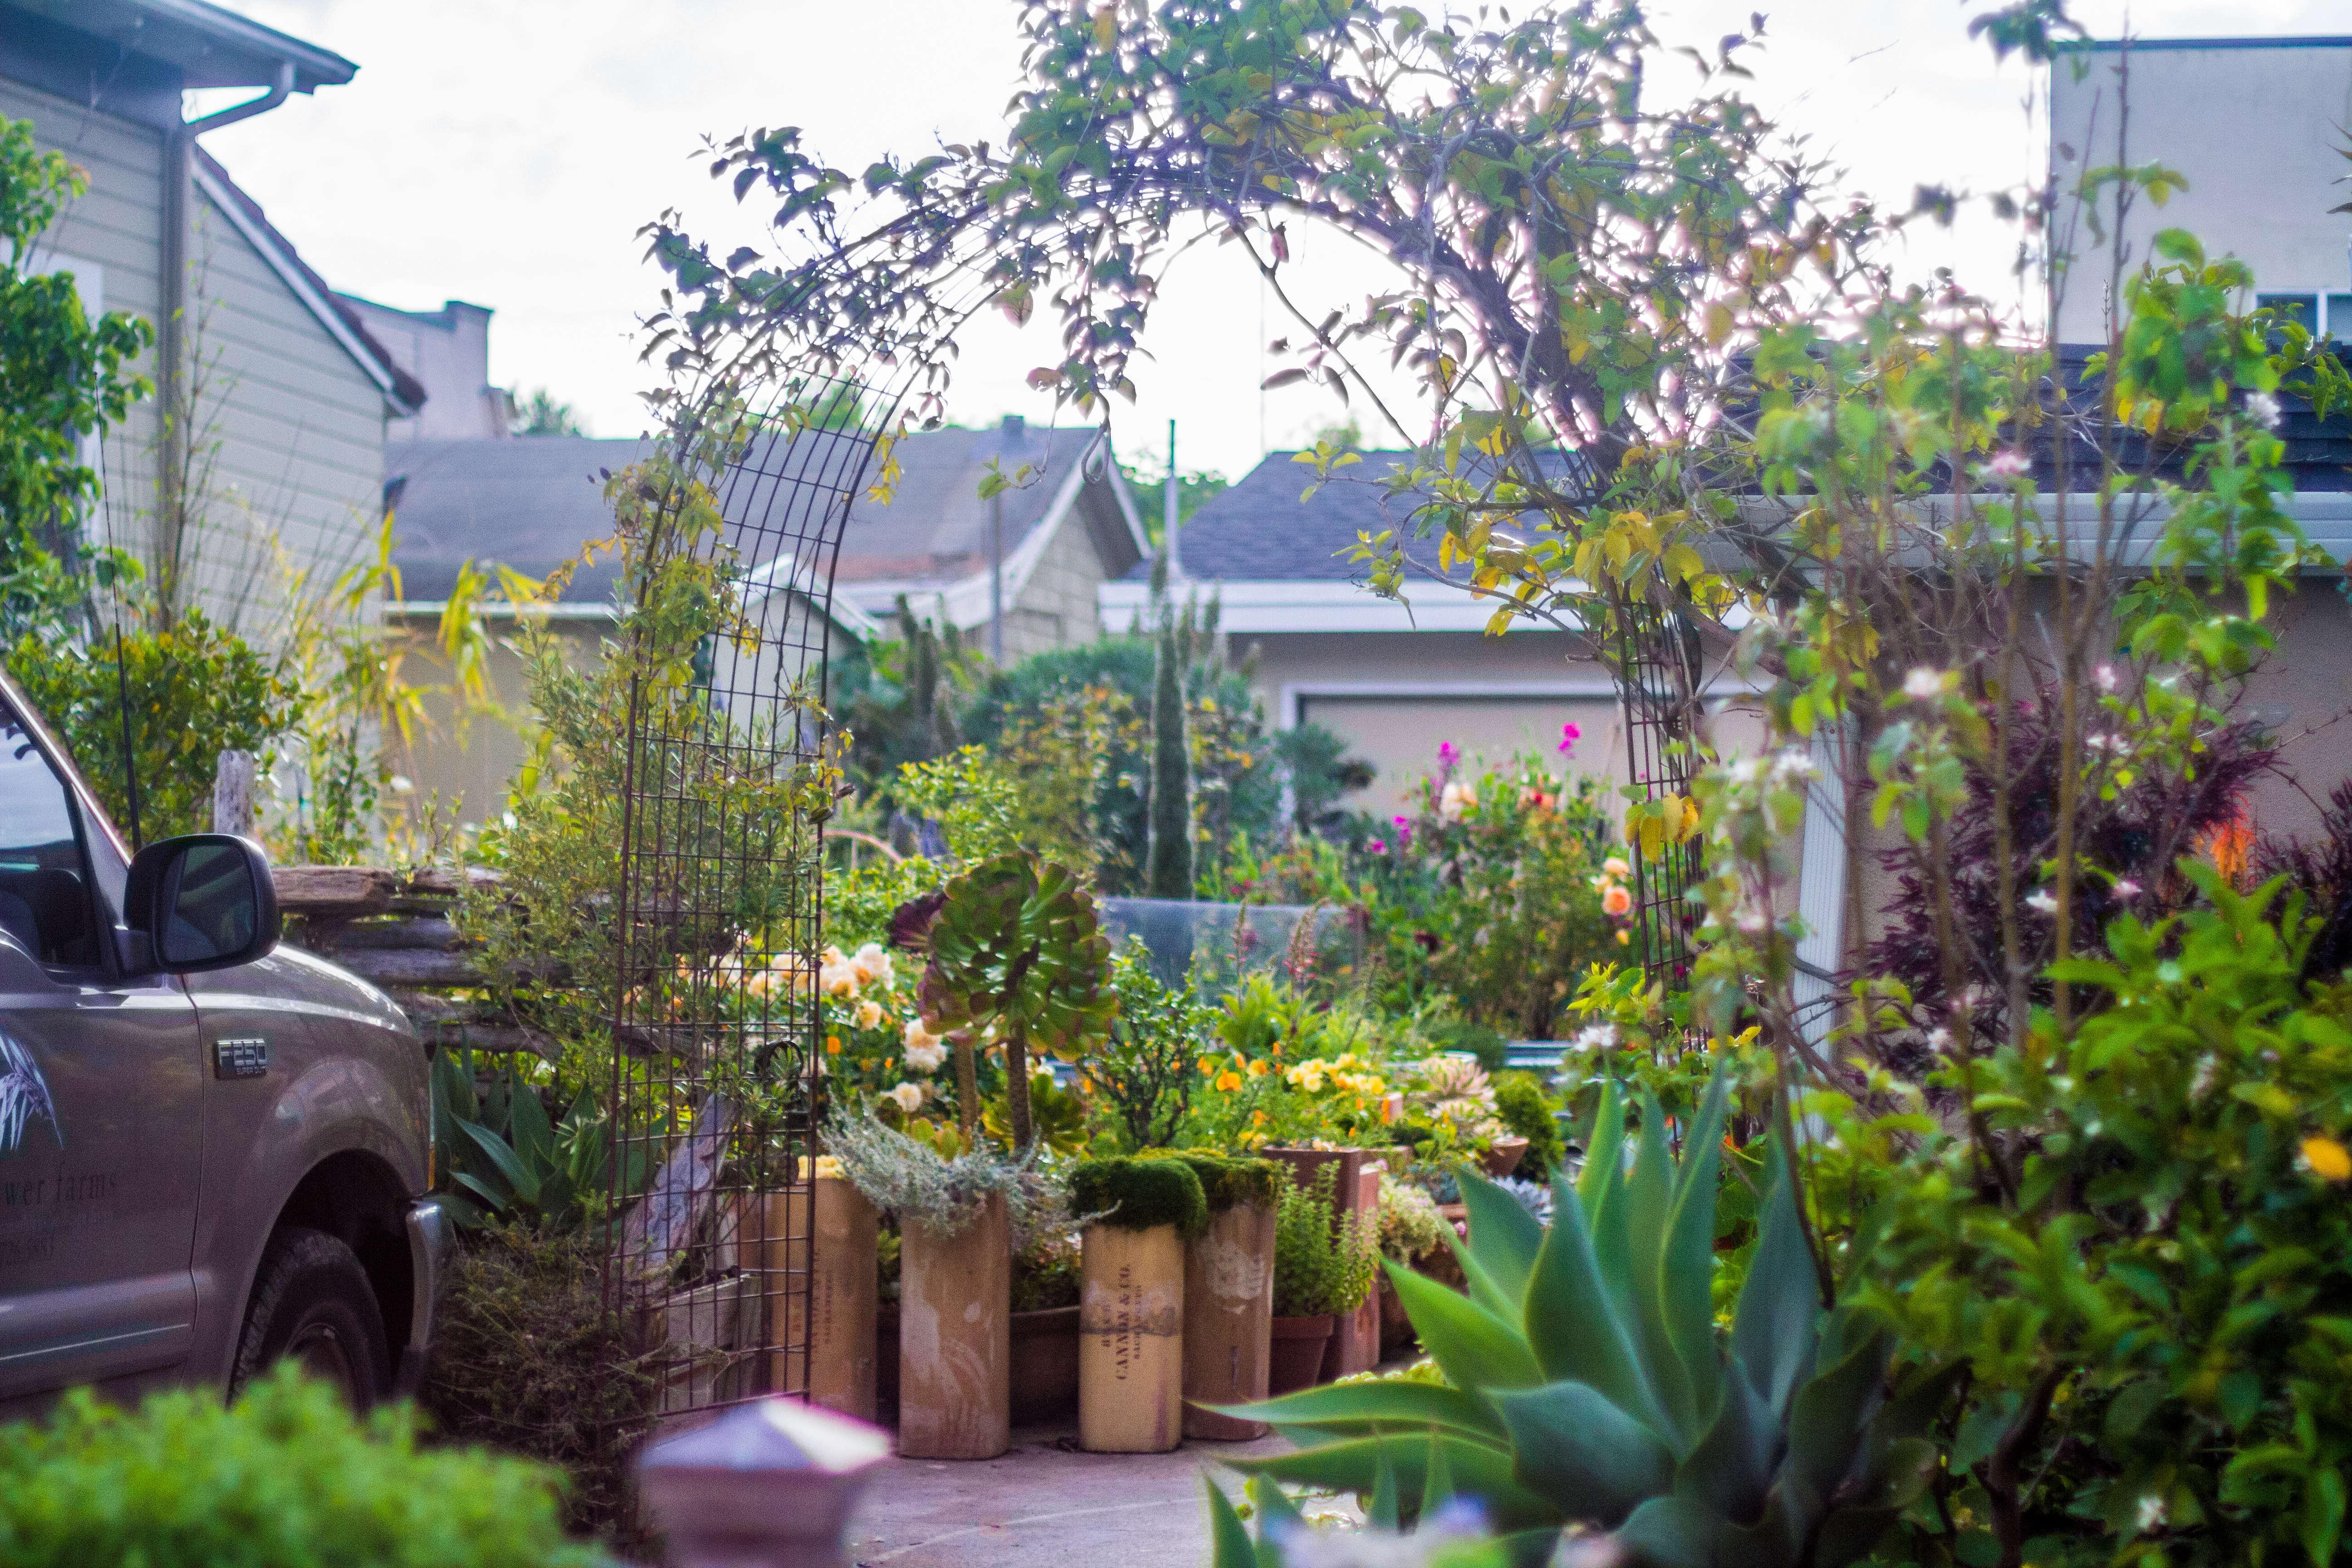 Superb Garden Visit: My Driveway Oasis In Half Moon Bay, California